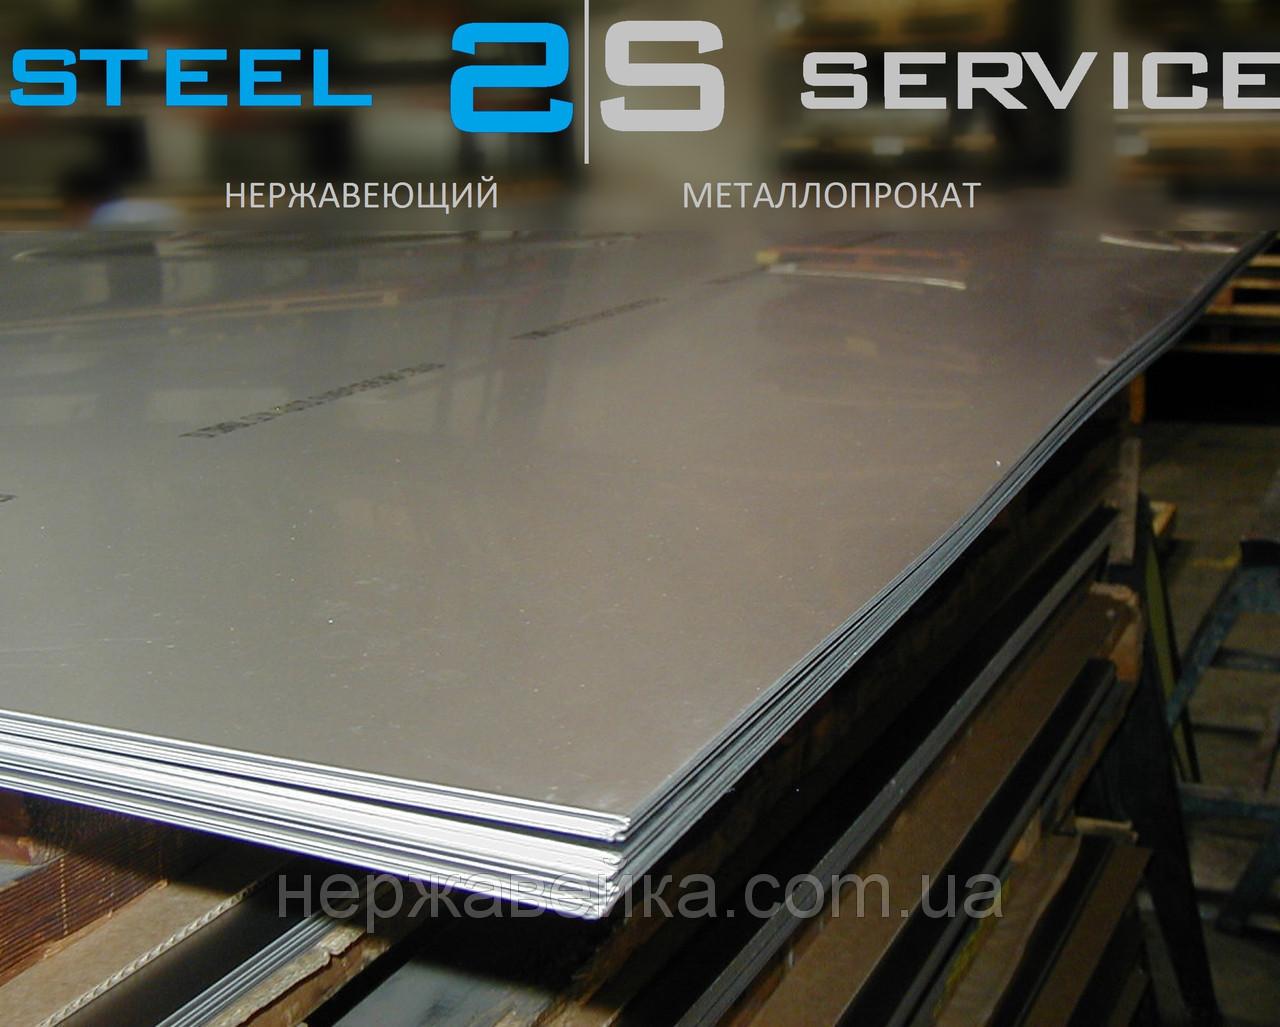 Нержавейка лист 12х1250х2500мм  AISI 316L(03Х17Н14М3) F1 - горячекатанный,  кислотостойкий